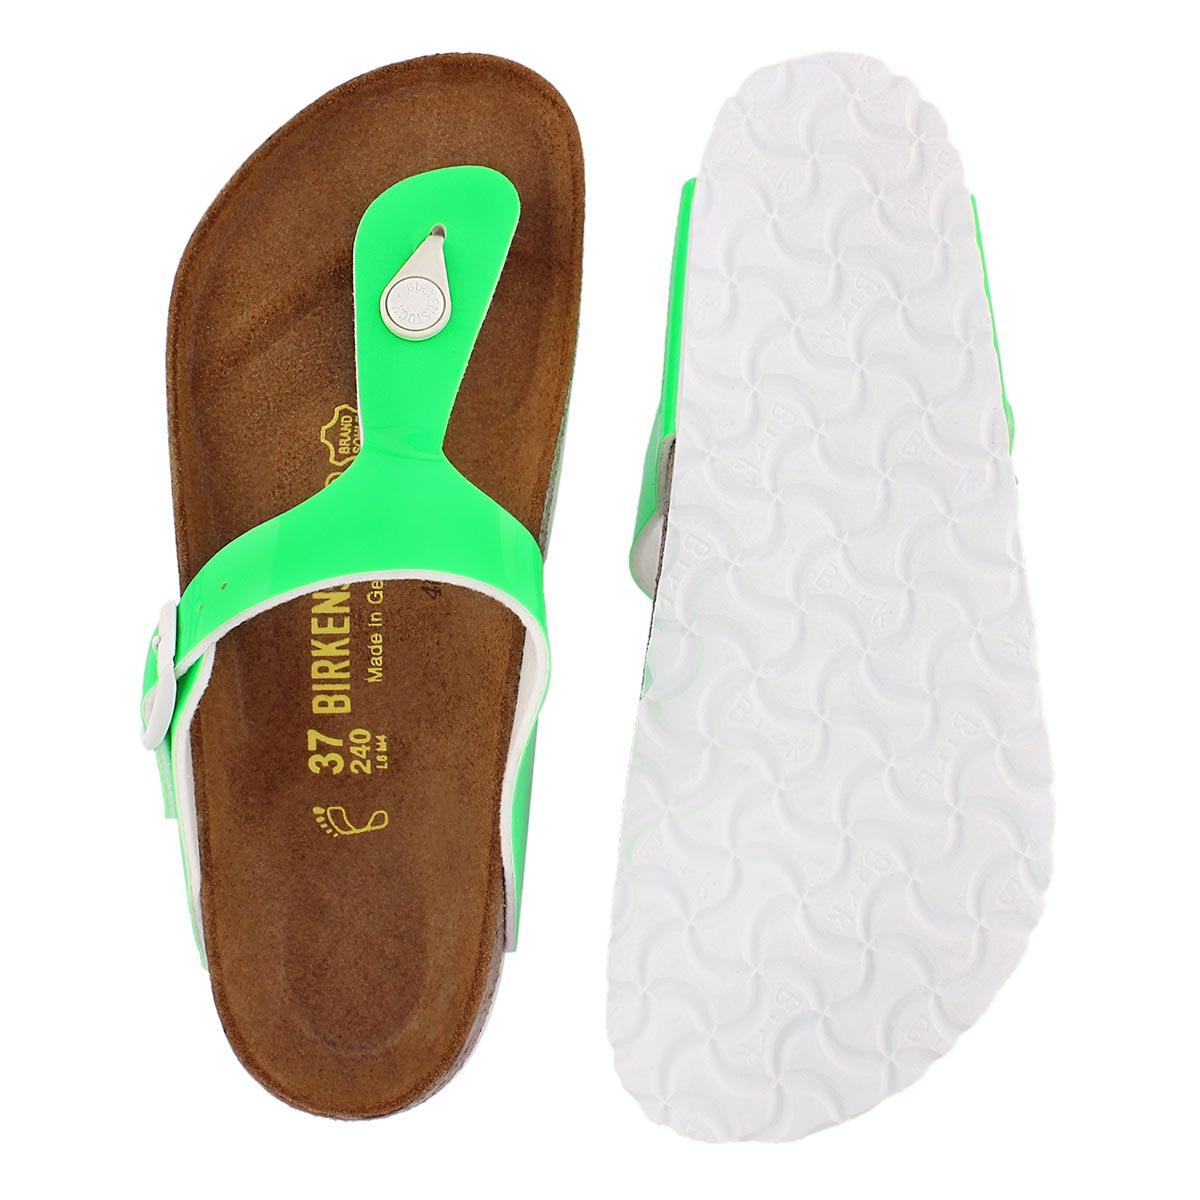 Sandale tong GIZEH, vert fluo, fem